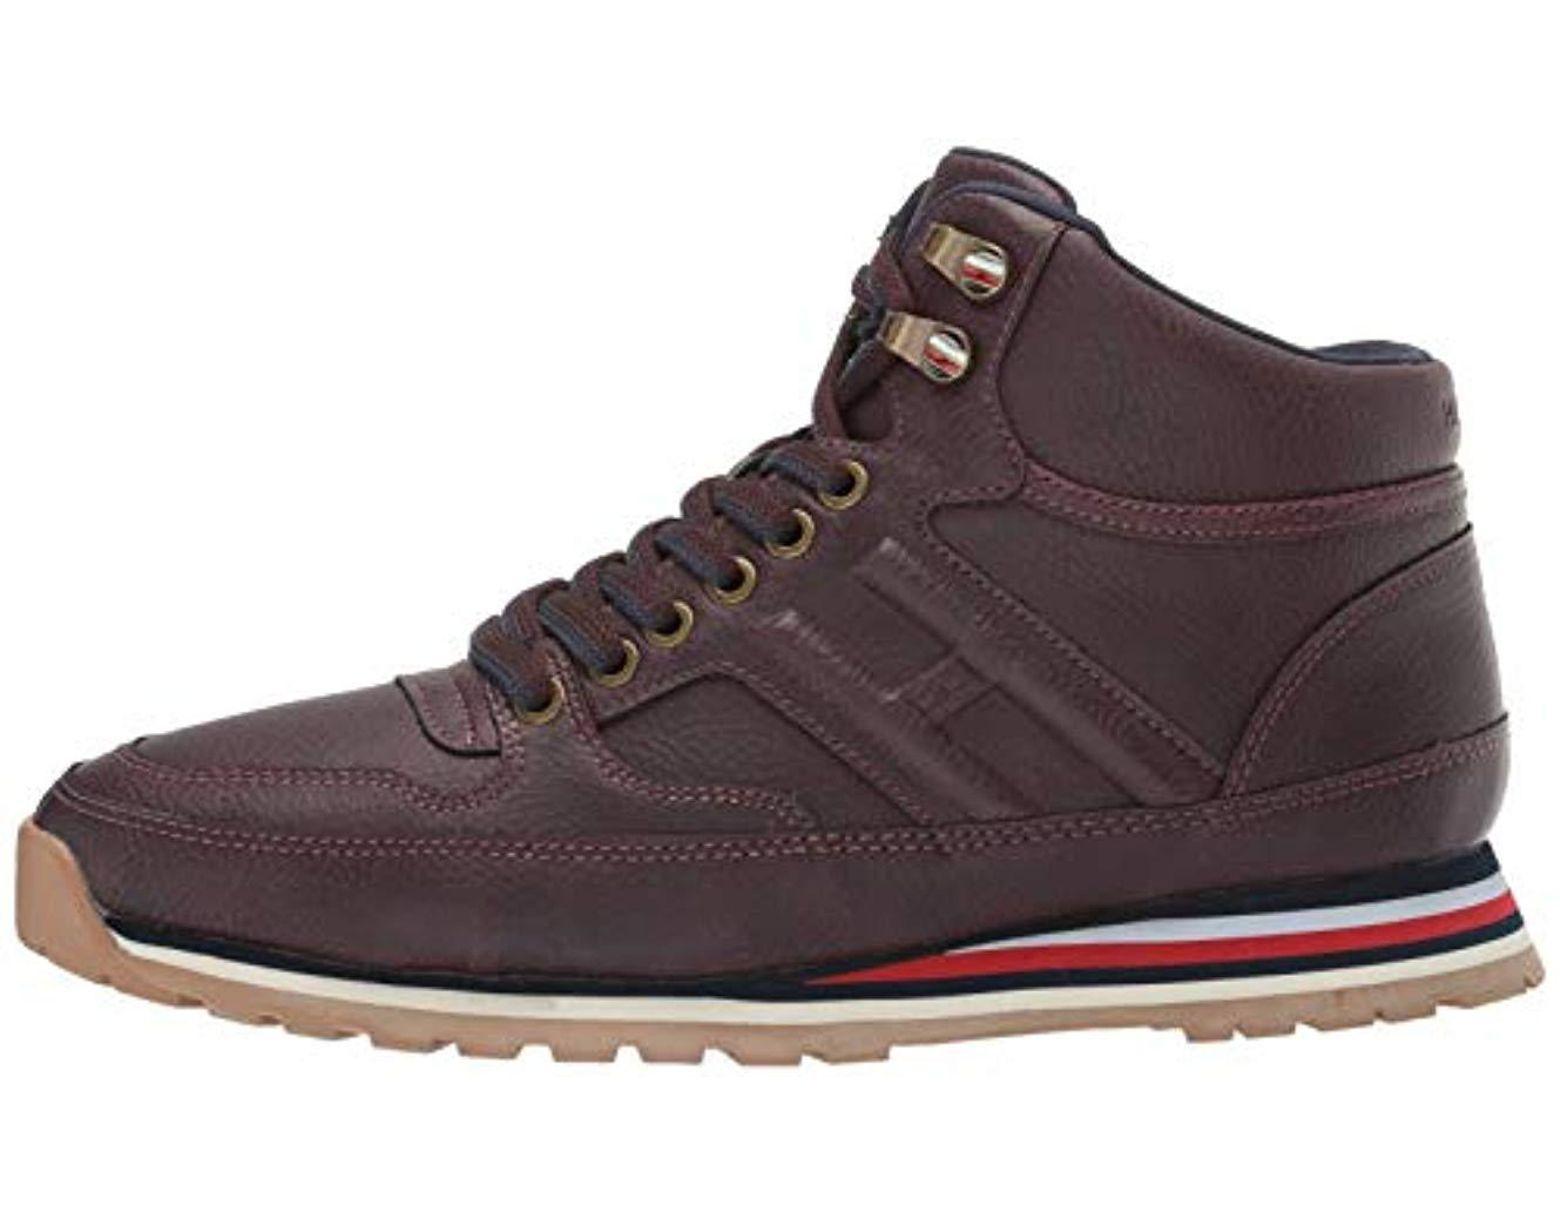 198065b1bc507 Men's Red Owens Sneaker